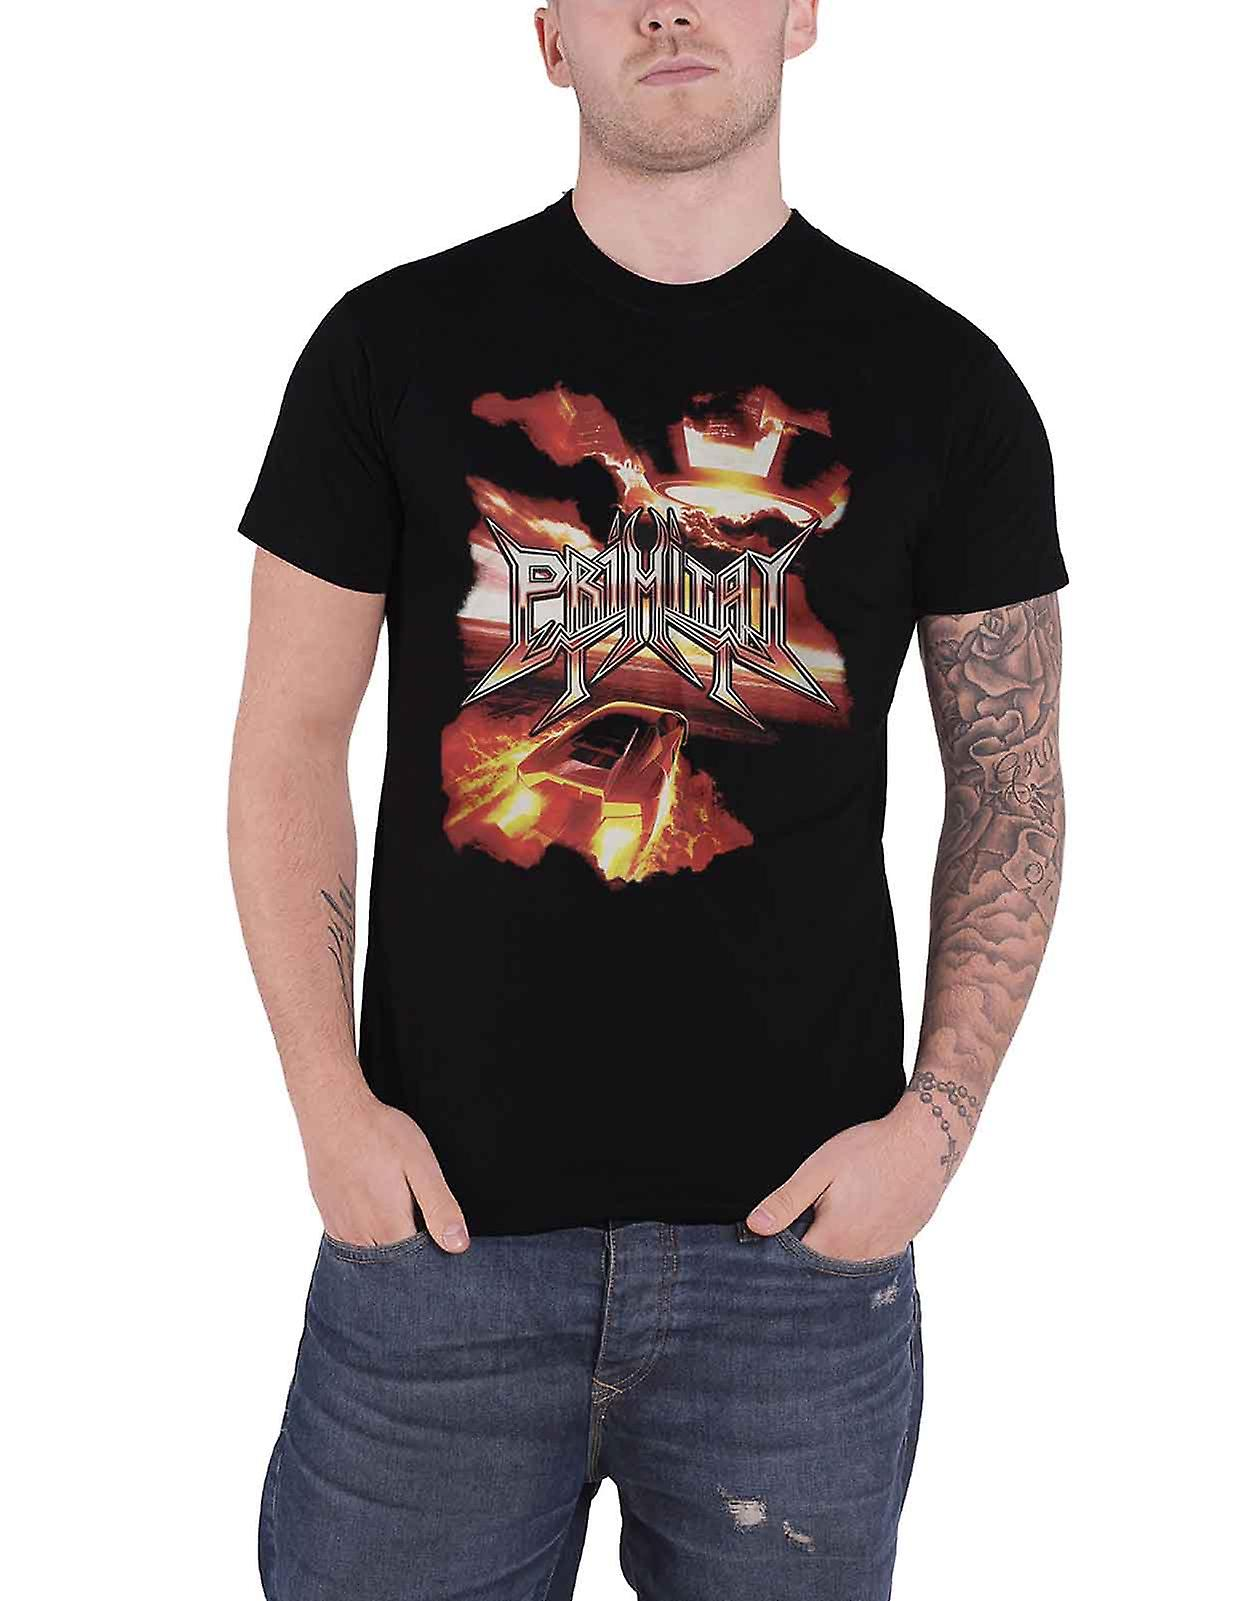 Primitai T Shirt The Calling Band Logo new Official Mens Black